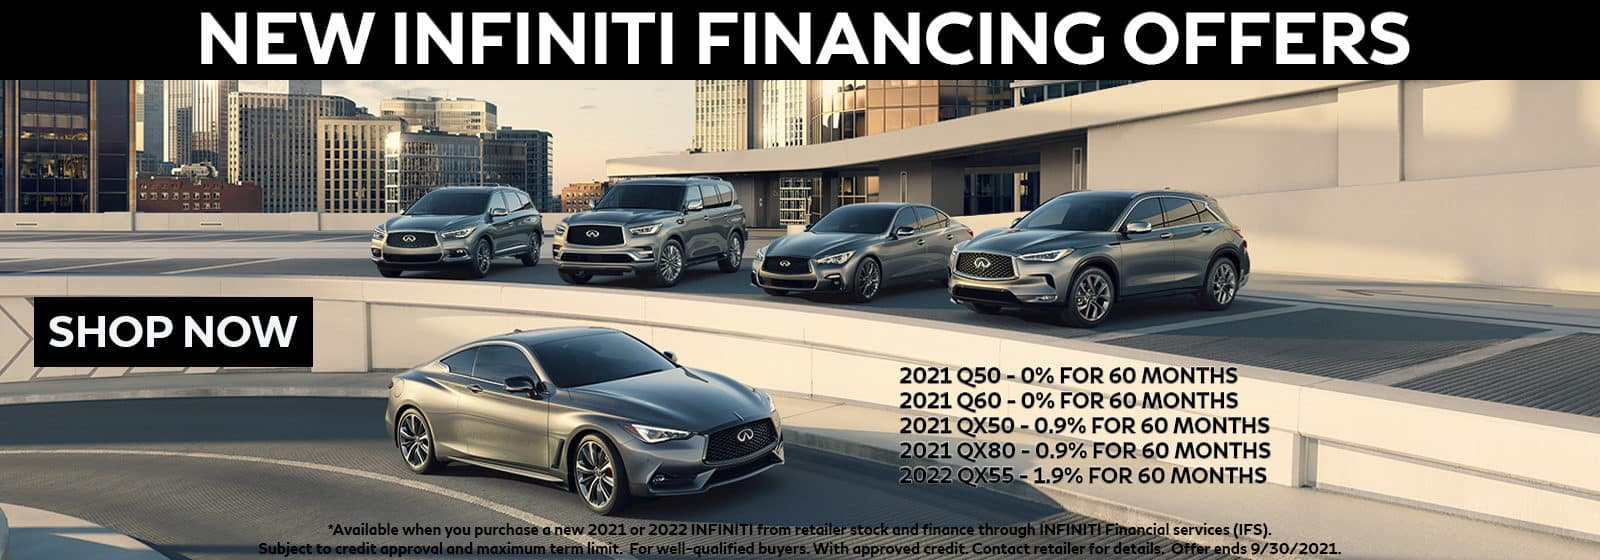 INFINITI Financing Offer